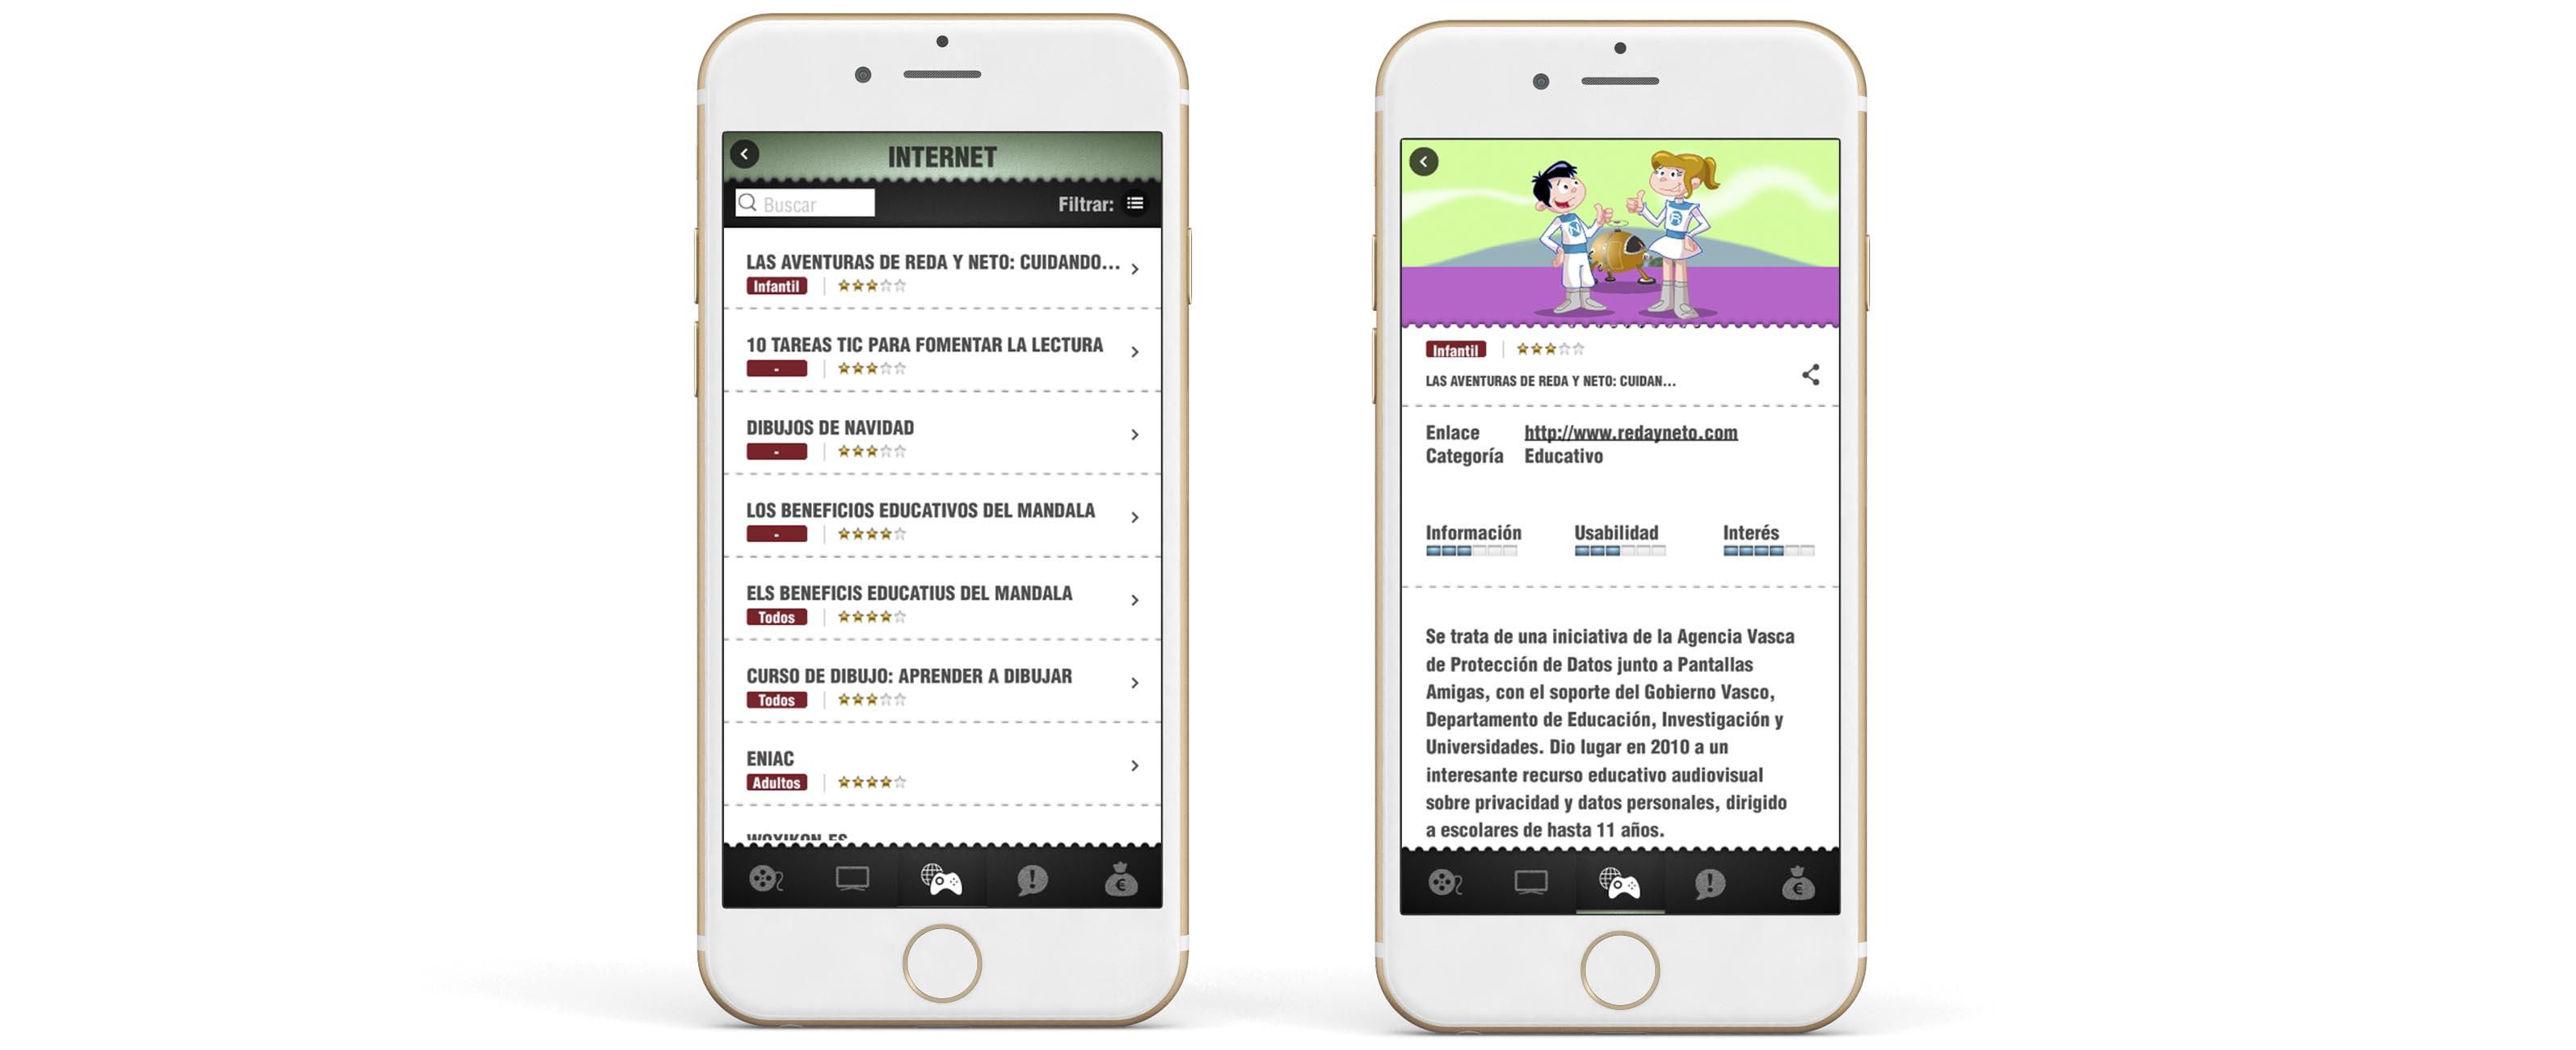 App Criticas Internet Contraste